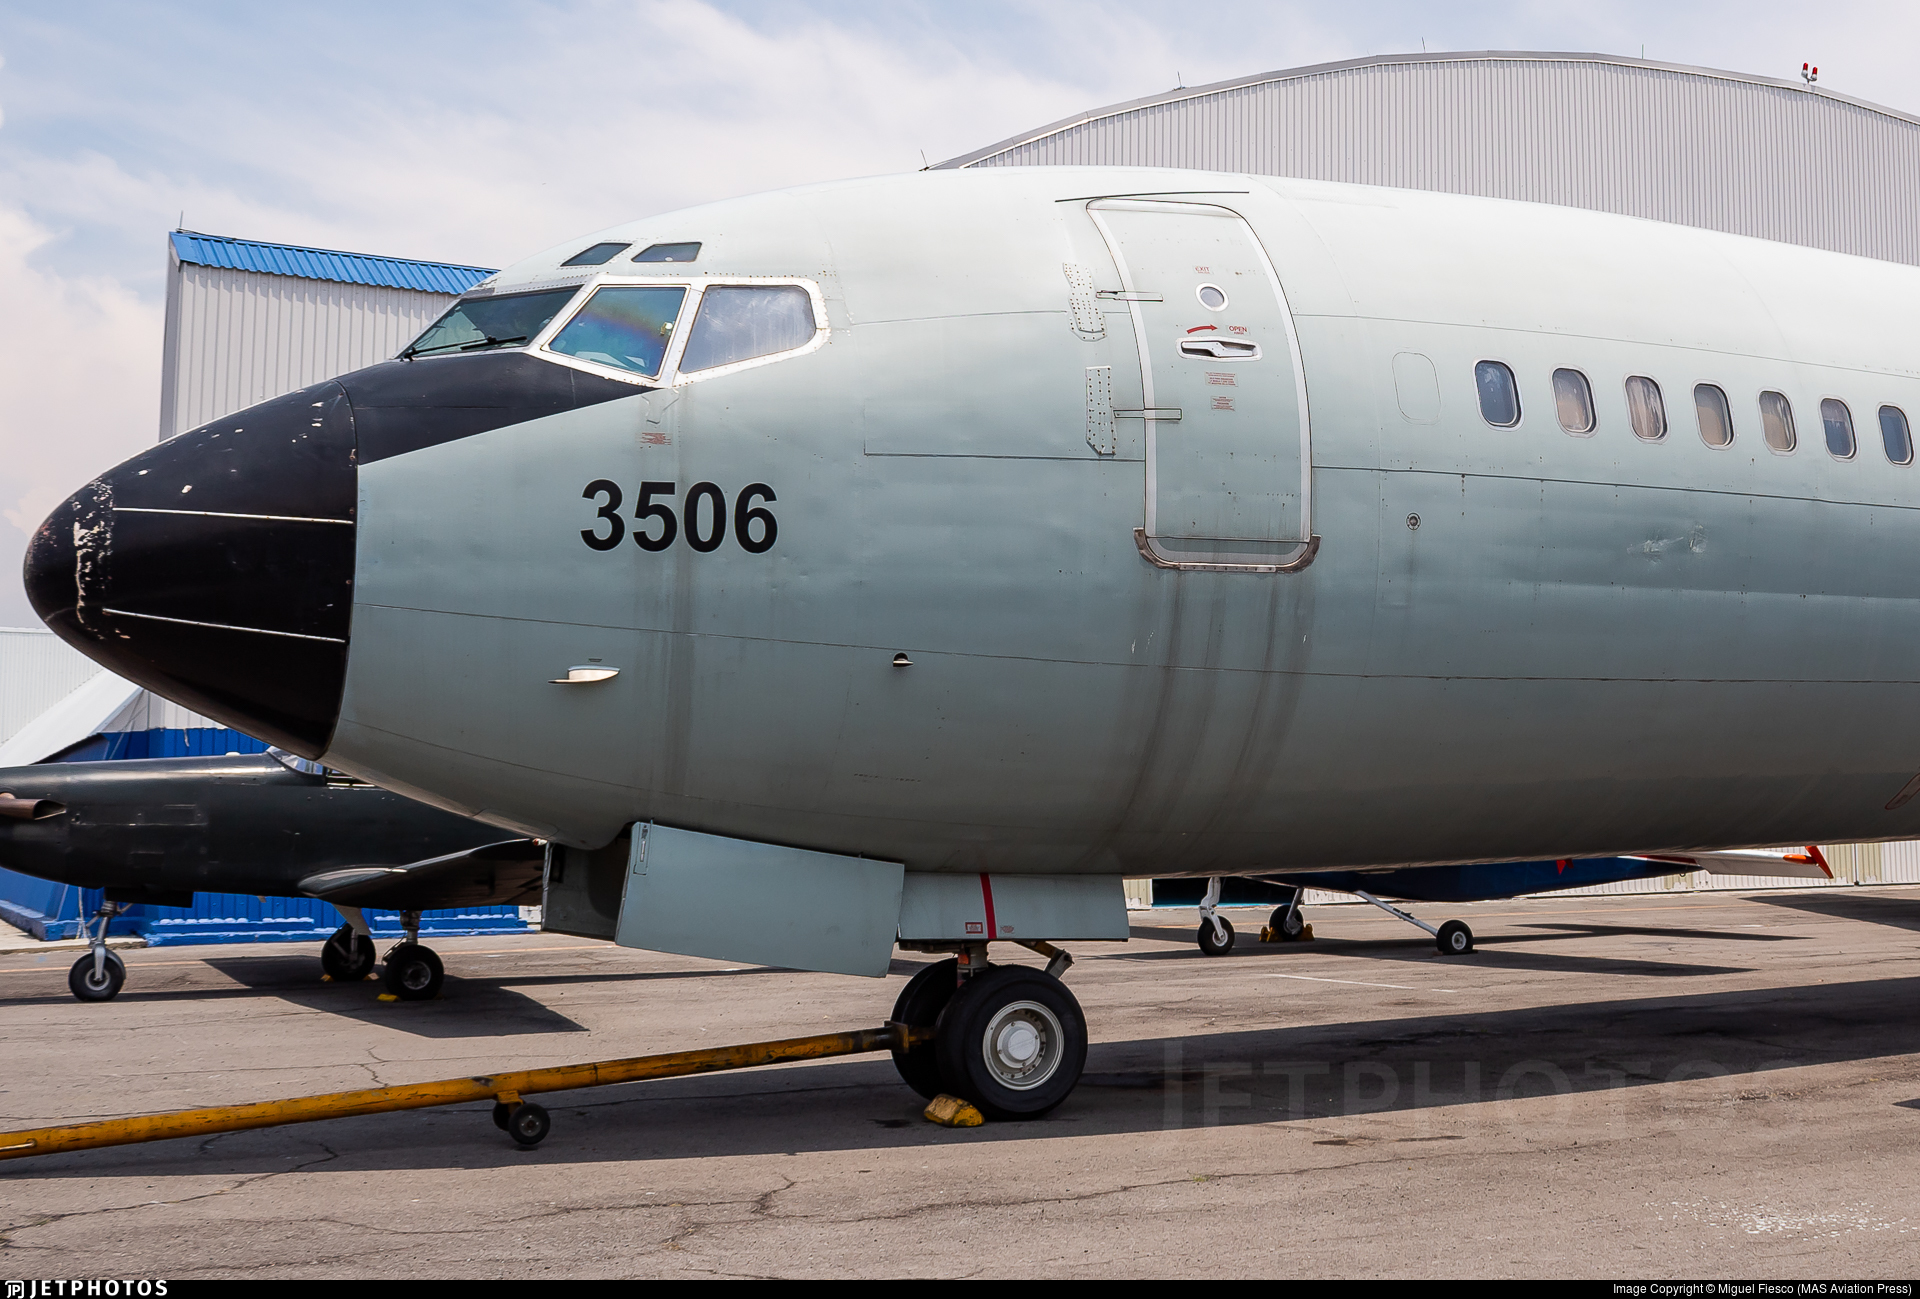 3506 - Boeing 727-264(Adv) - Mexico - Air Force